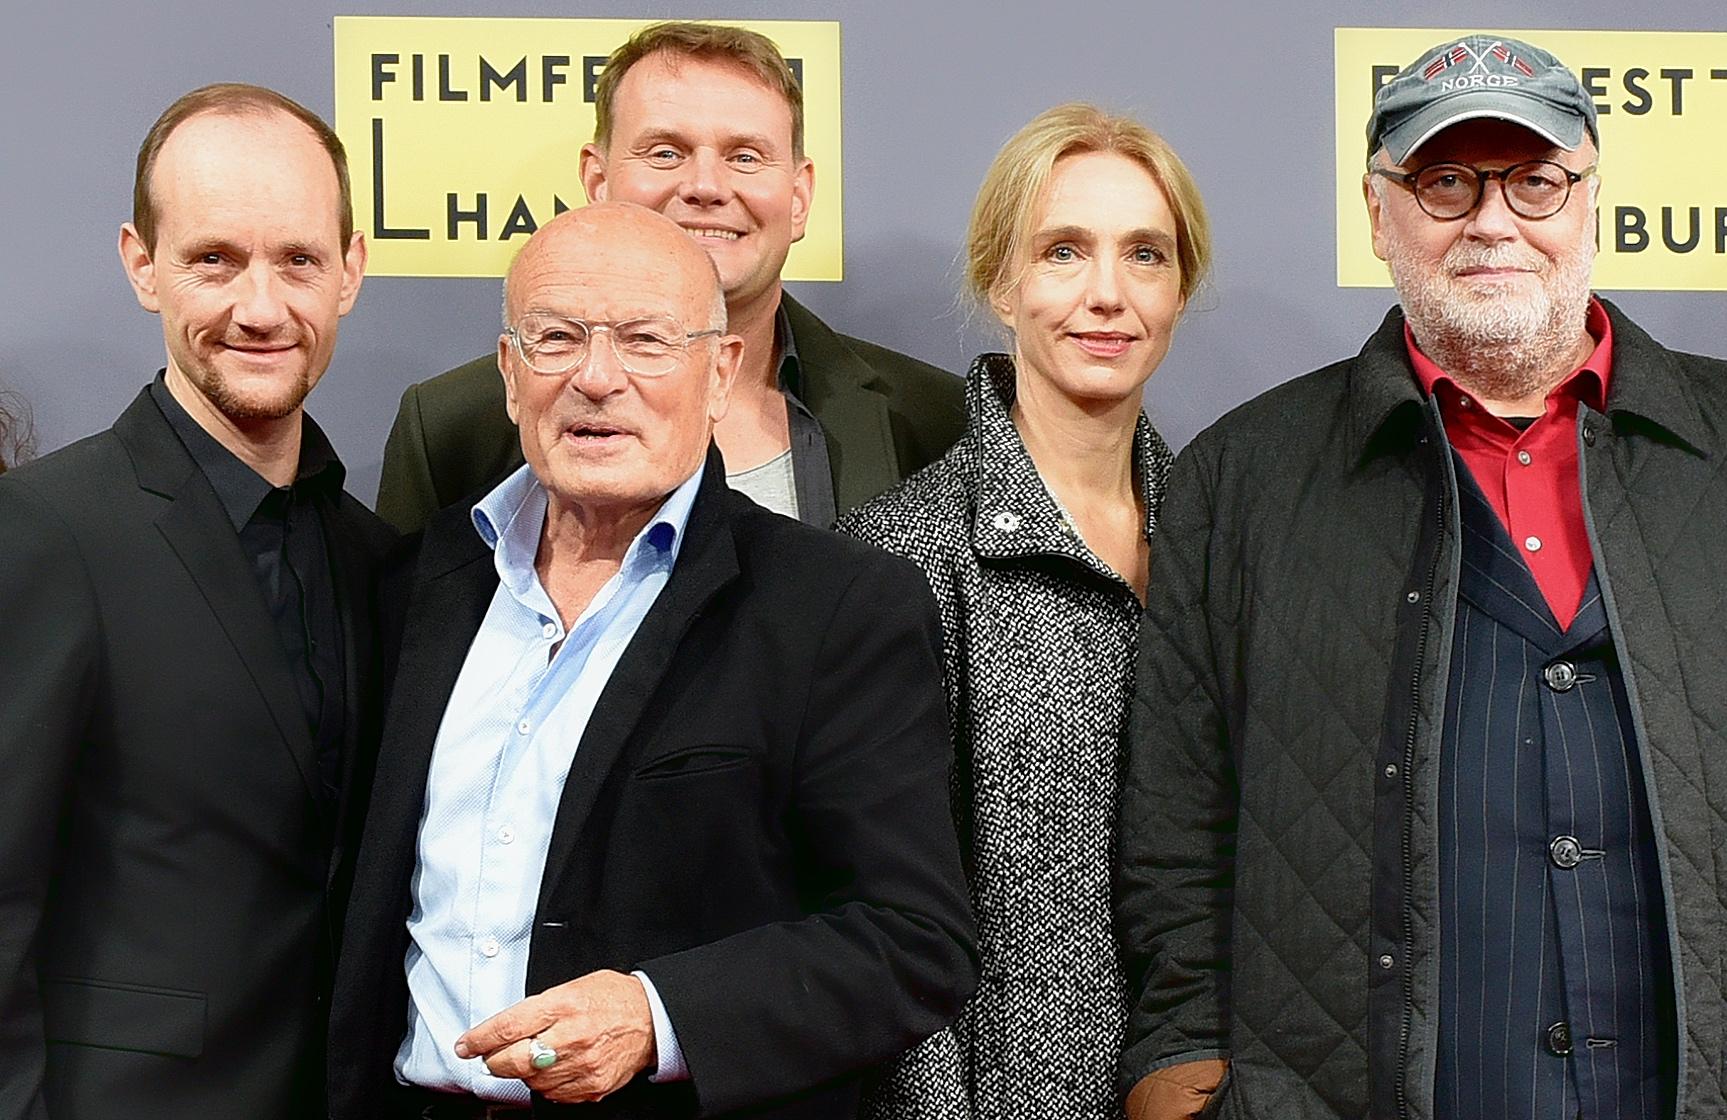 Filmfest Hamburg 2017 with Michael Ihnow, Volker Schlöndorff, Devid Striesow,Ursina Lardi, Thomas Thieme